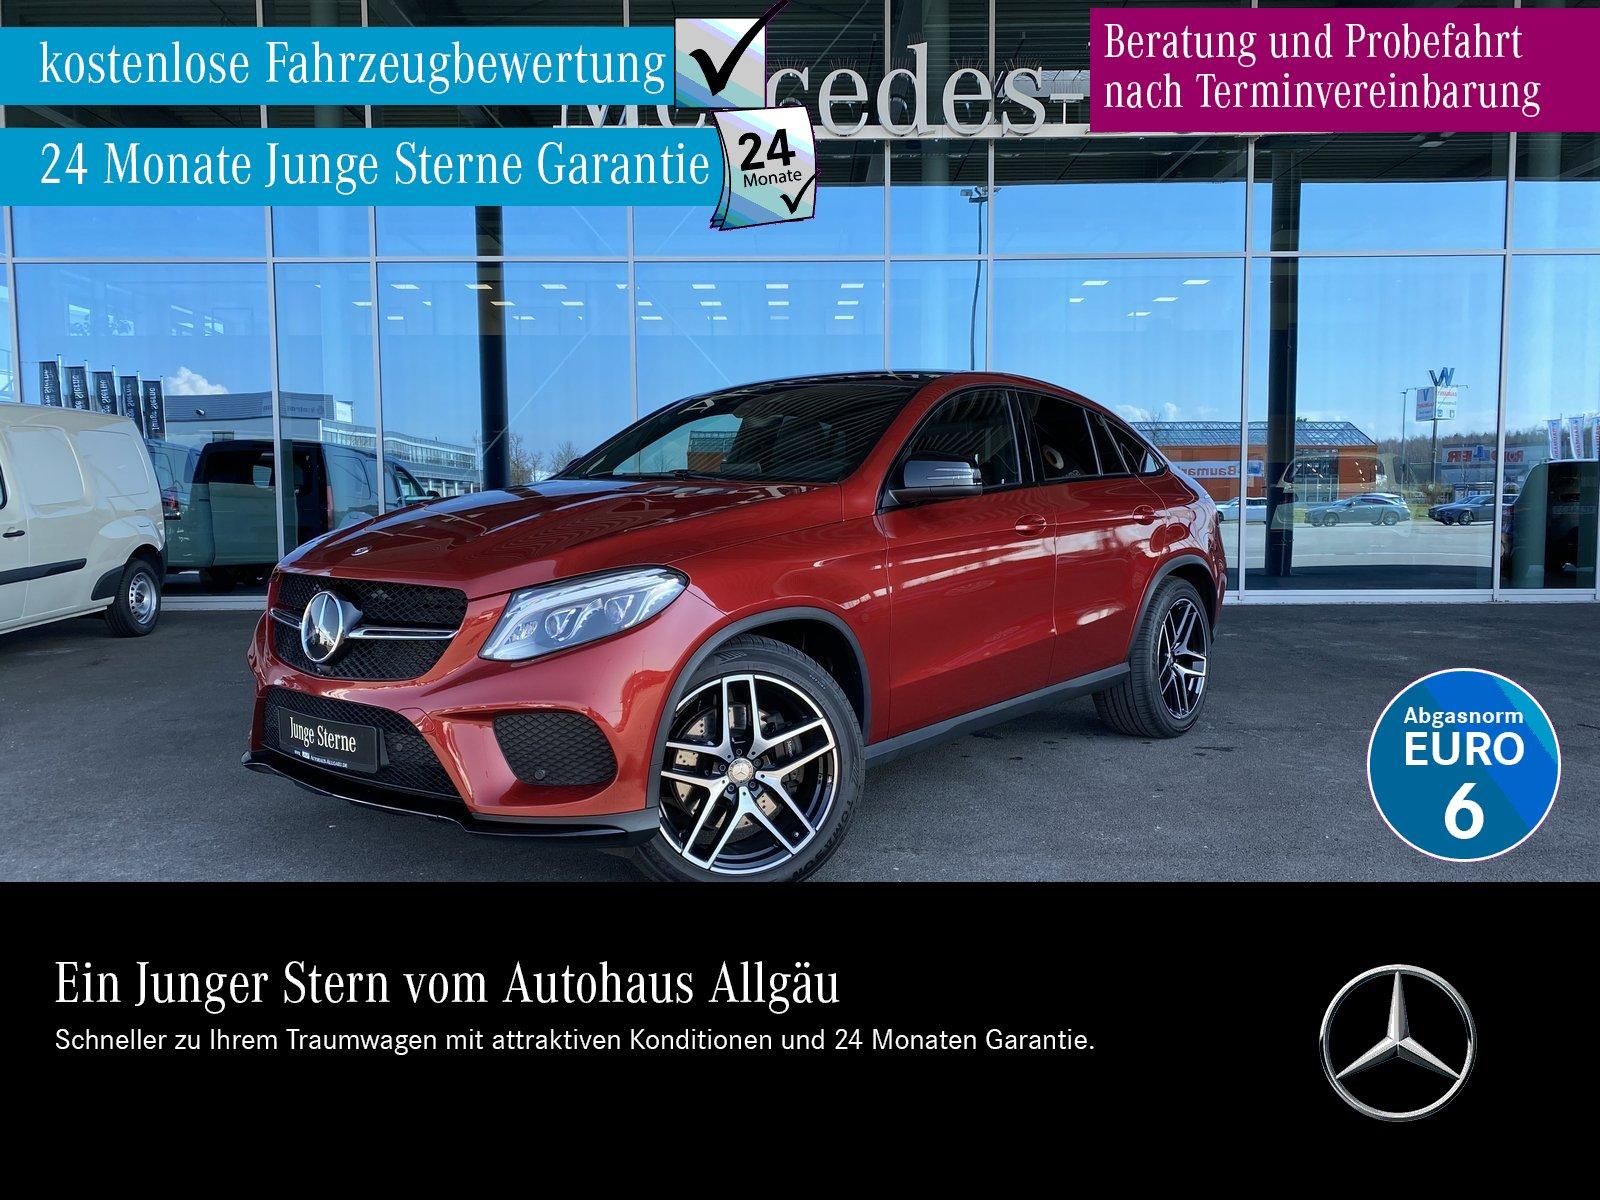 Mercedes-Benz GLE 400 4M Coupe AMG+ILS+AHK+AIRM+360°+PANO+H&K+, Jahr 2016, Benzin